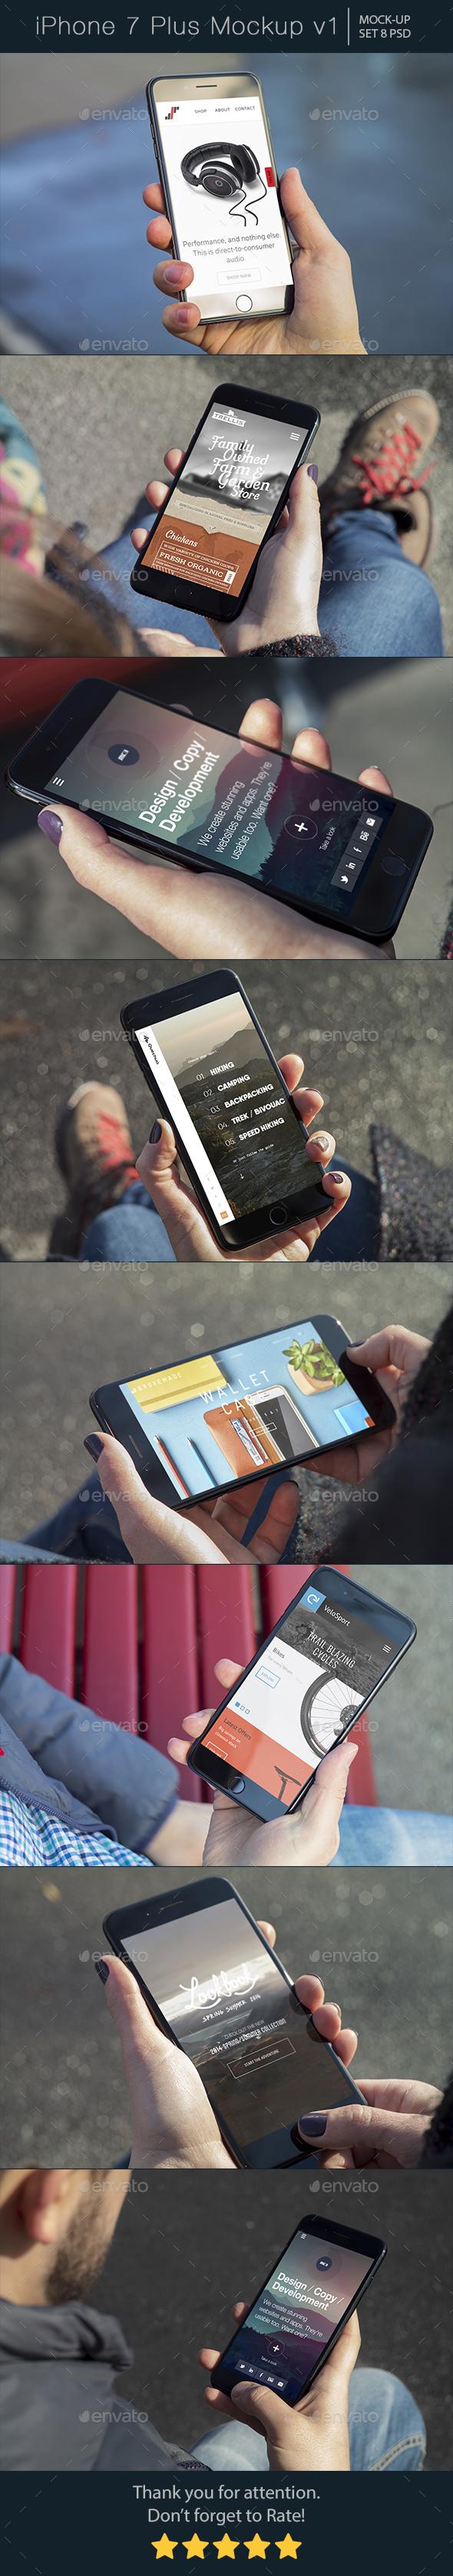 iPhone 7 Plus Mockup v1 - Mobile Displays